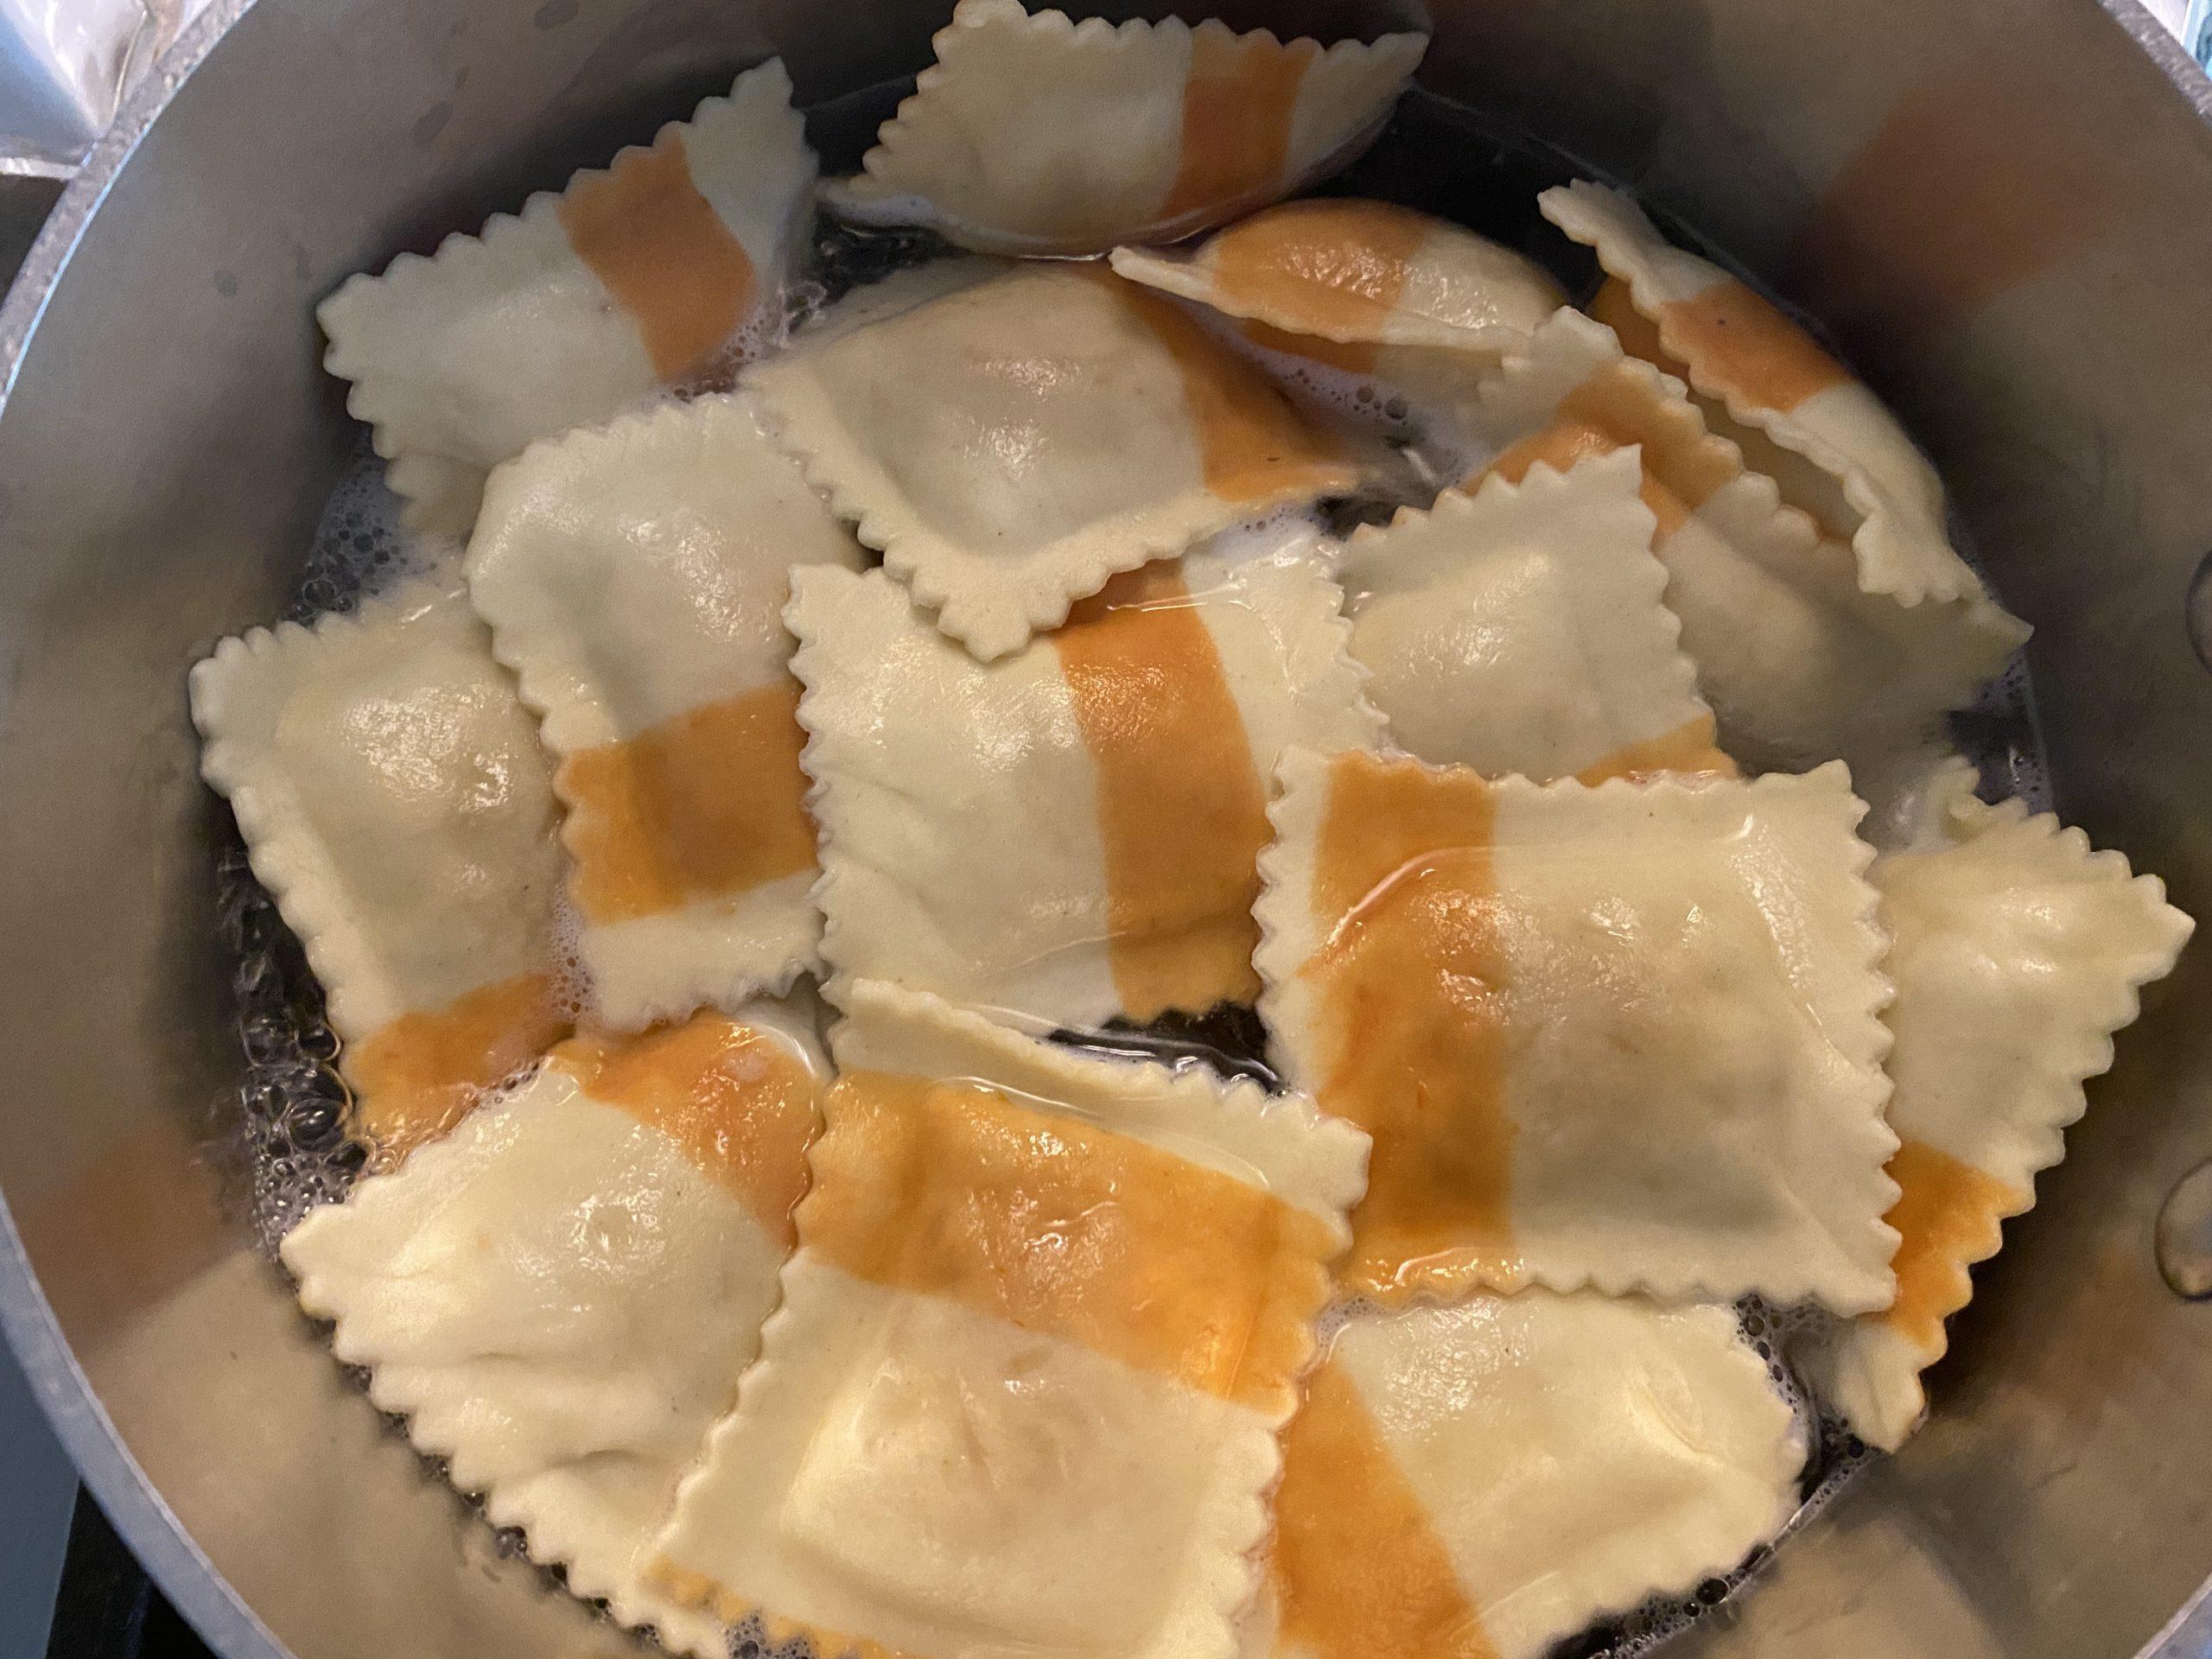 Caprese Ravioli with Parmesan cheese and basil